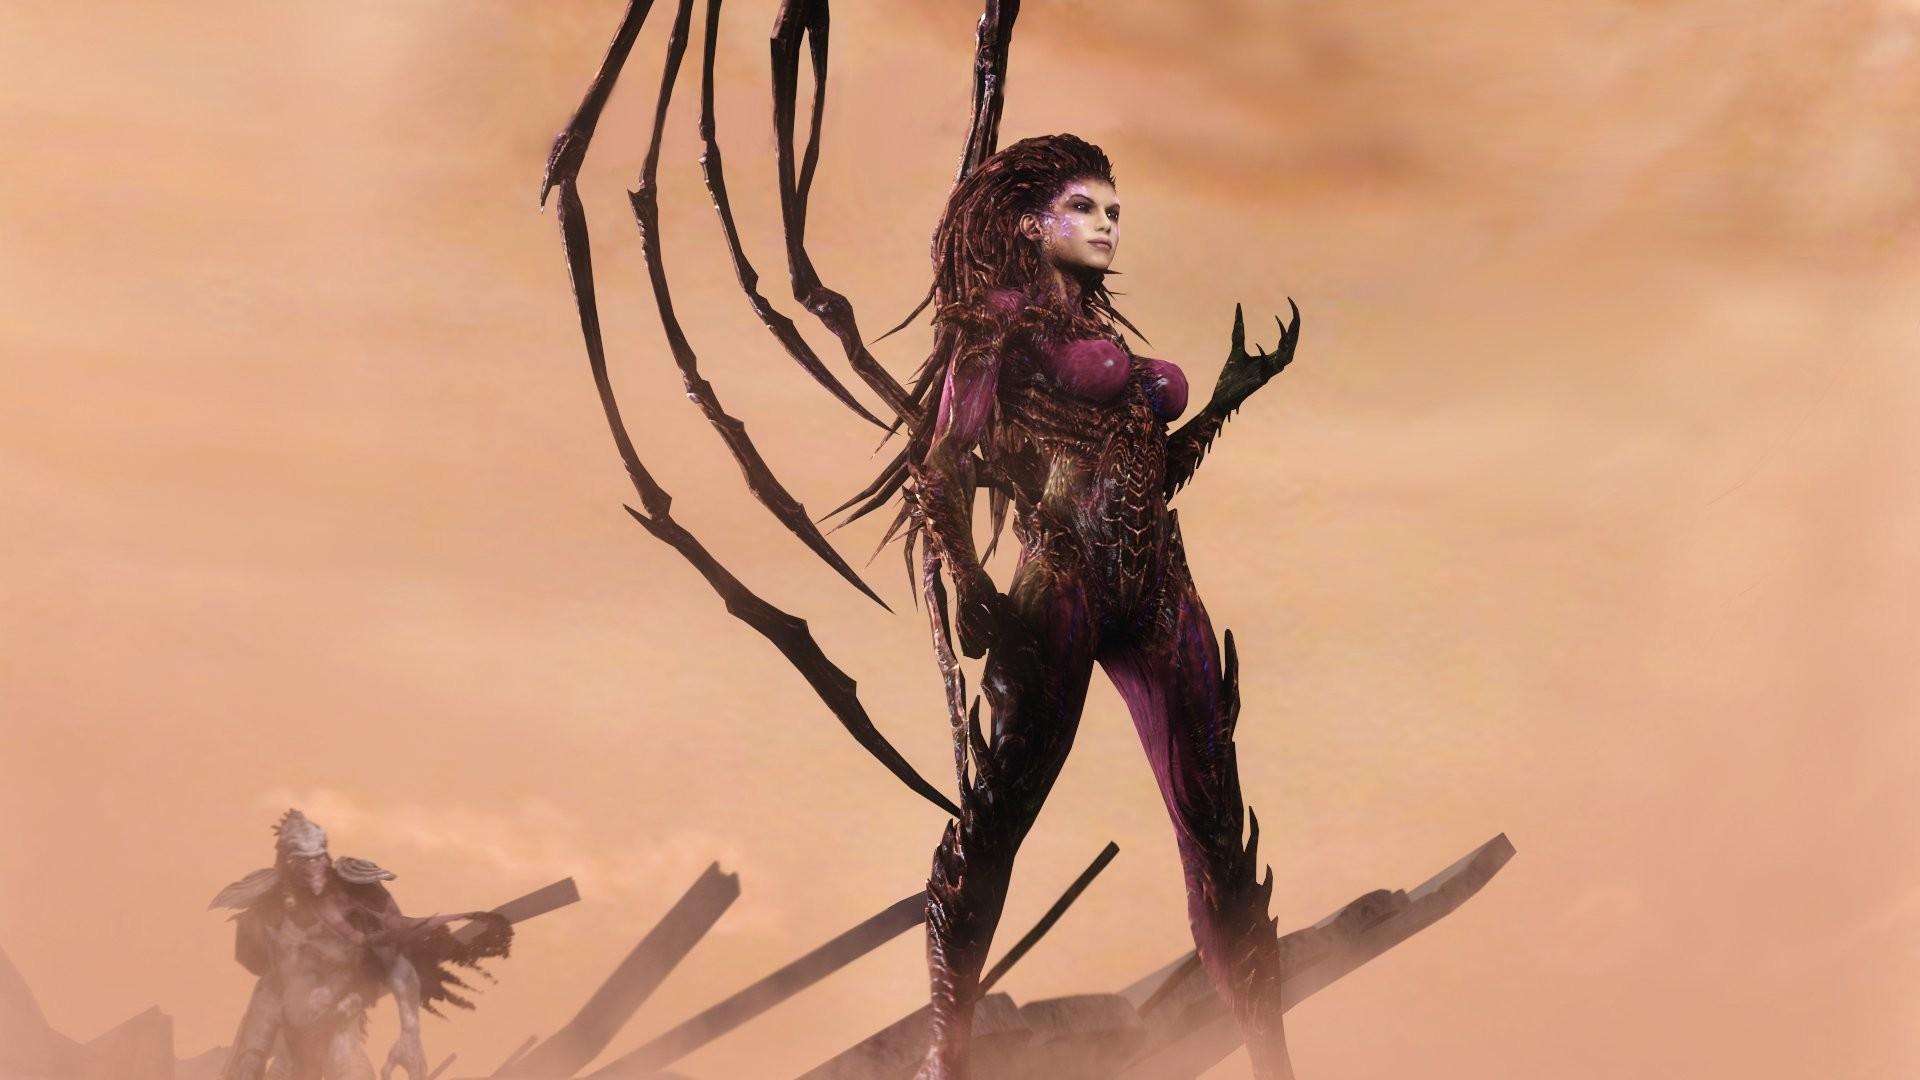 StarCraft 2 Supernatural beings Warrior Queen of Blades Sarah Kerrigan  Games Fantasy sci-fi wallpaper | | 437558 | WallpaperUP